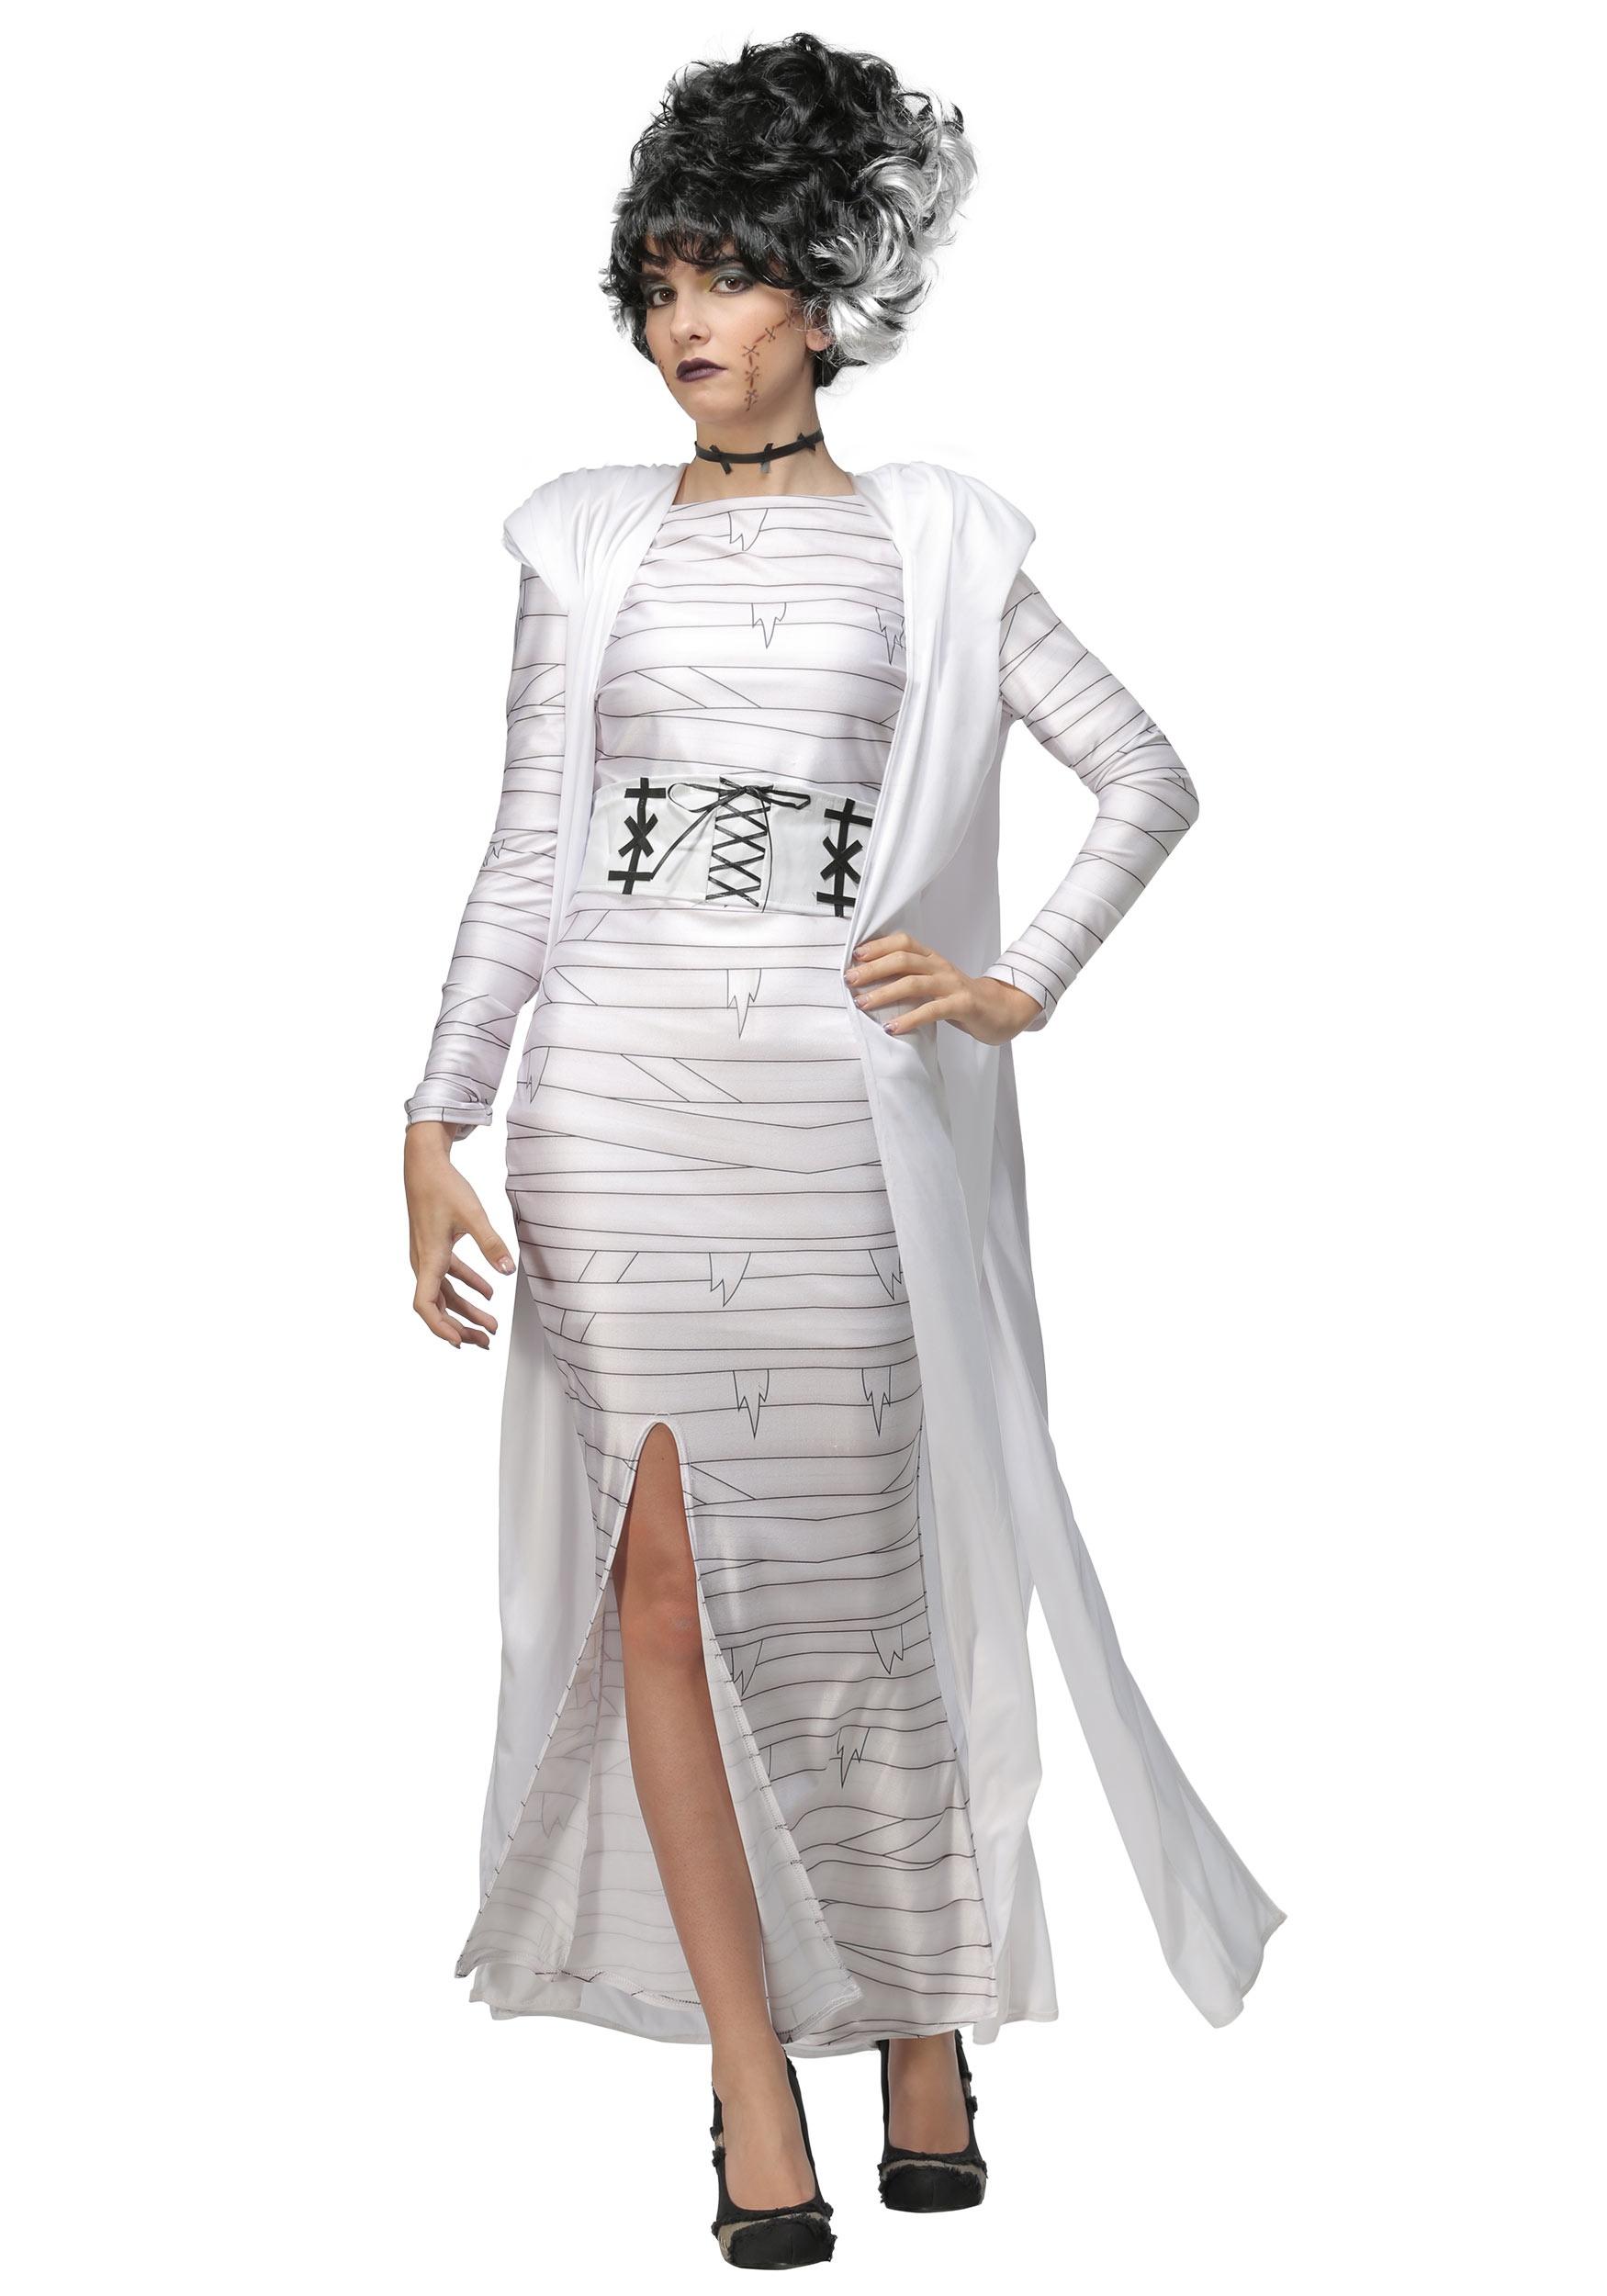 Women's Bride of Frankenstein Plus Size Costume